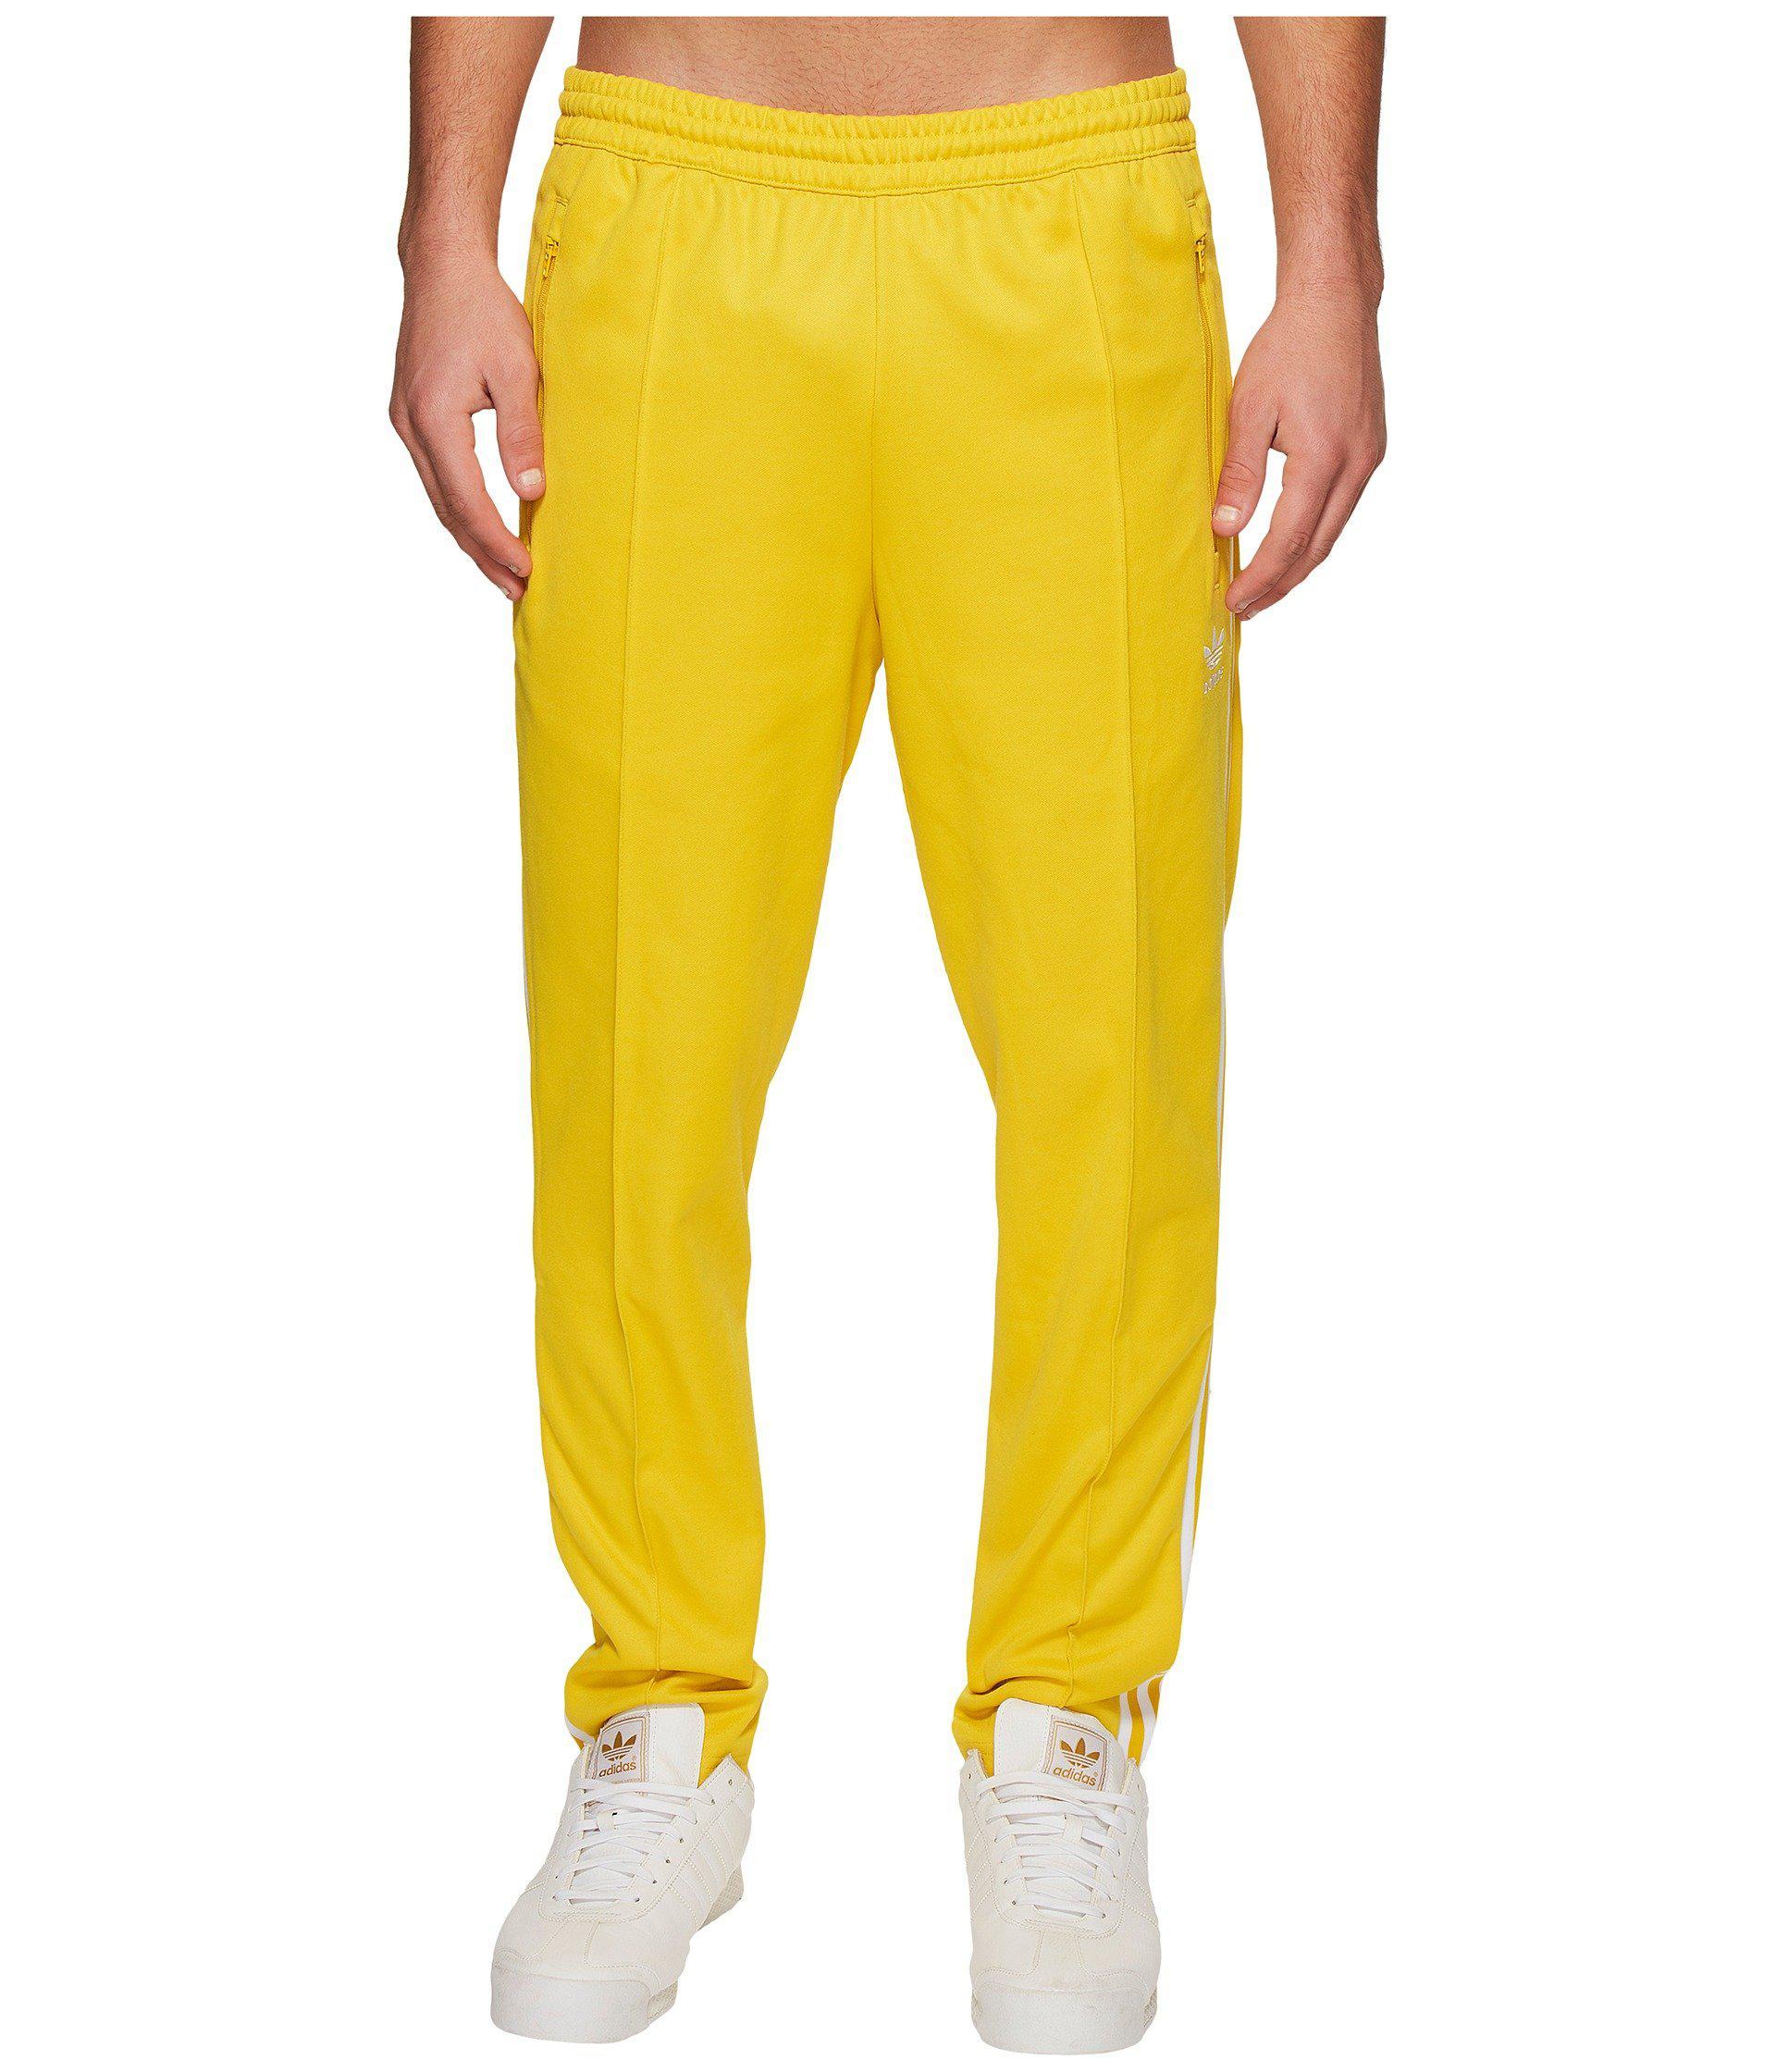 adidas beckenbauer yellow pants